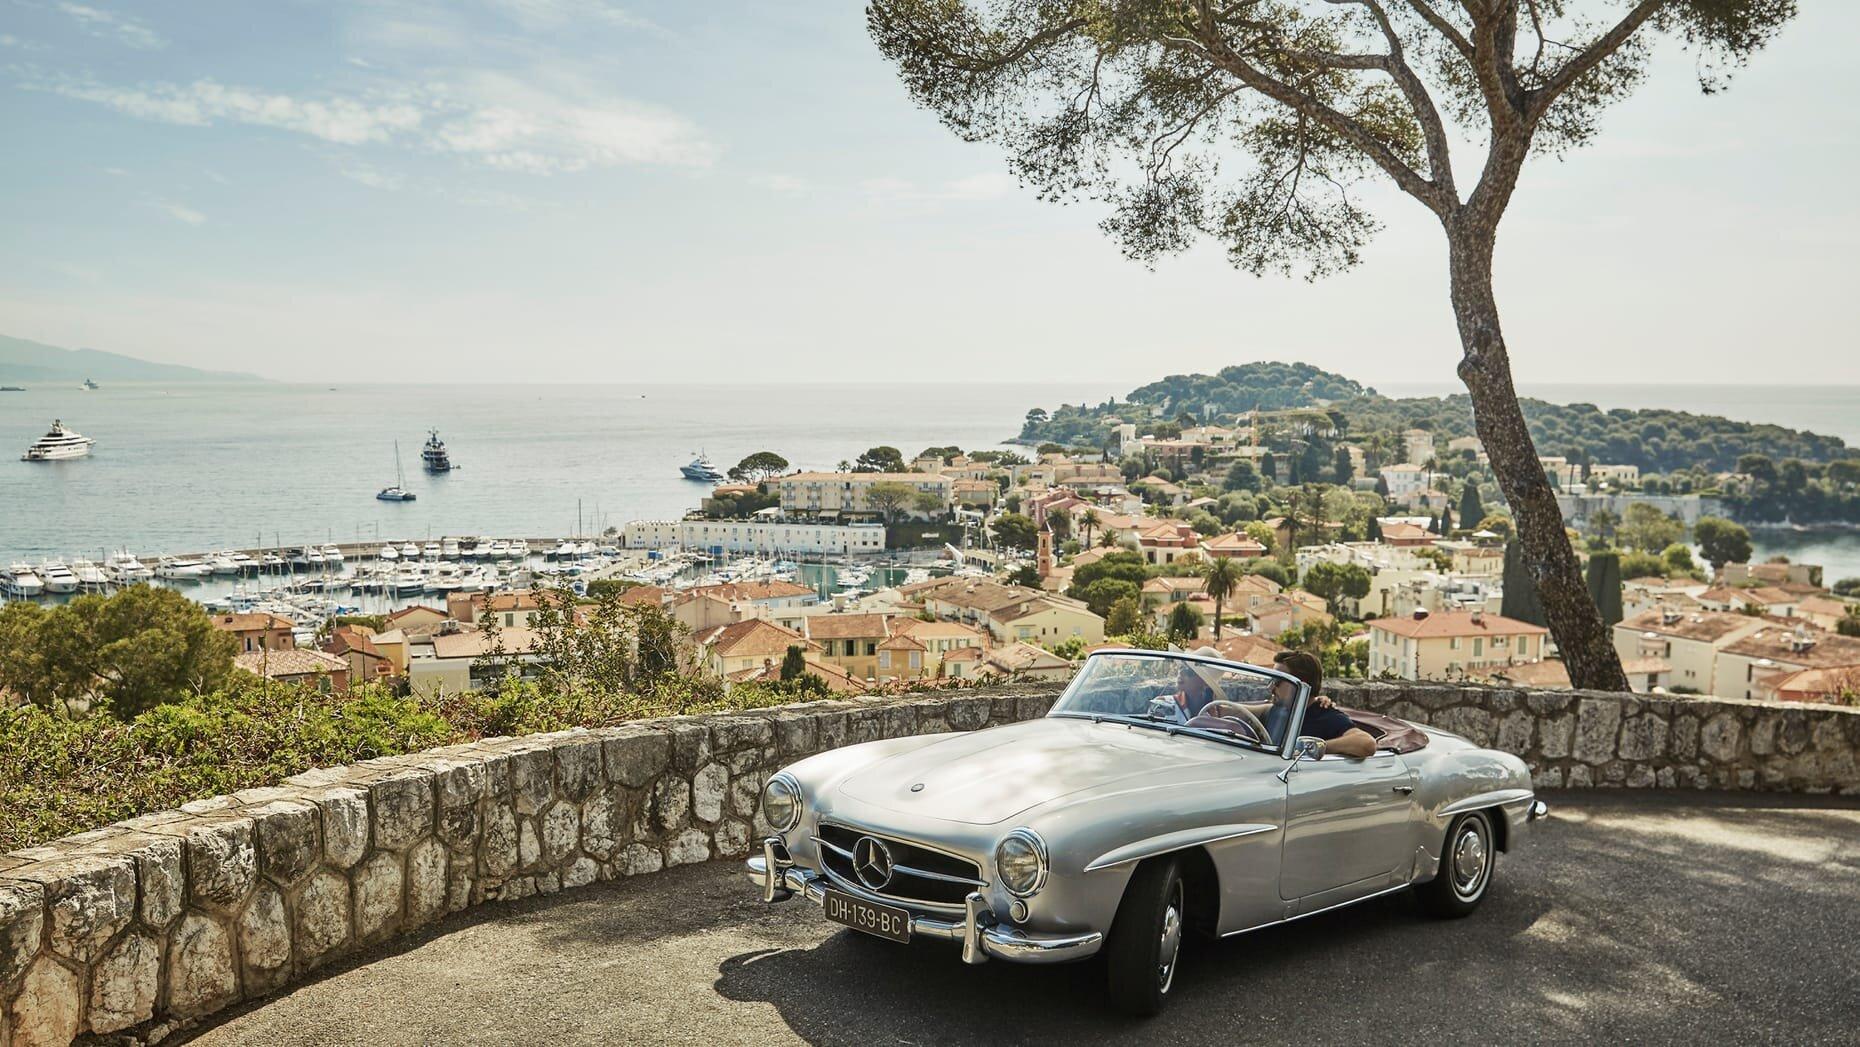 Four Seasons hotels offers classic La Dolce Vita luxury road trip